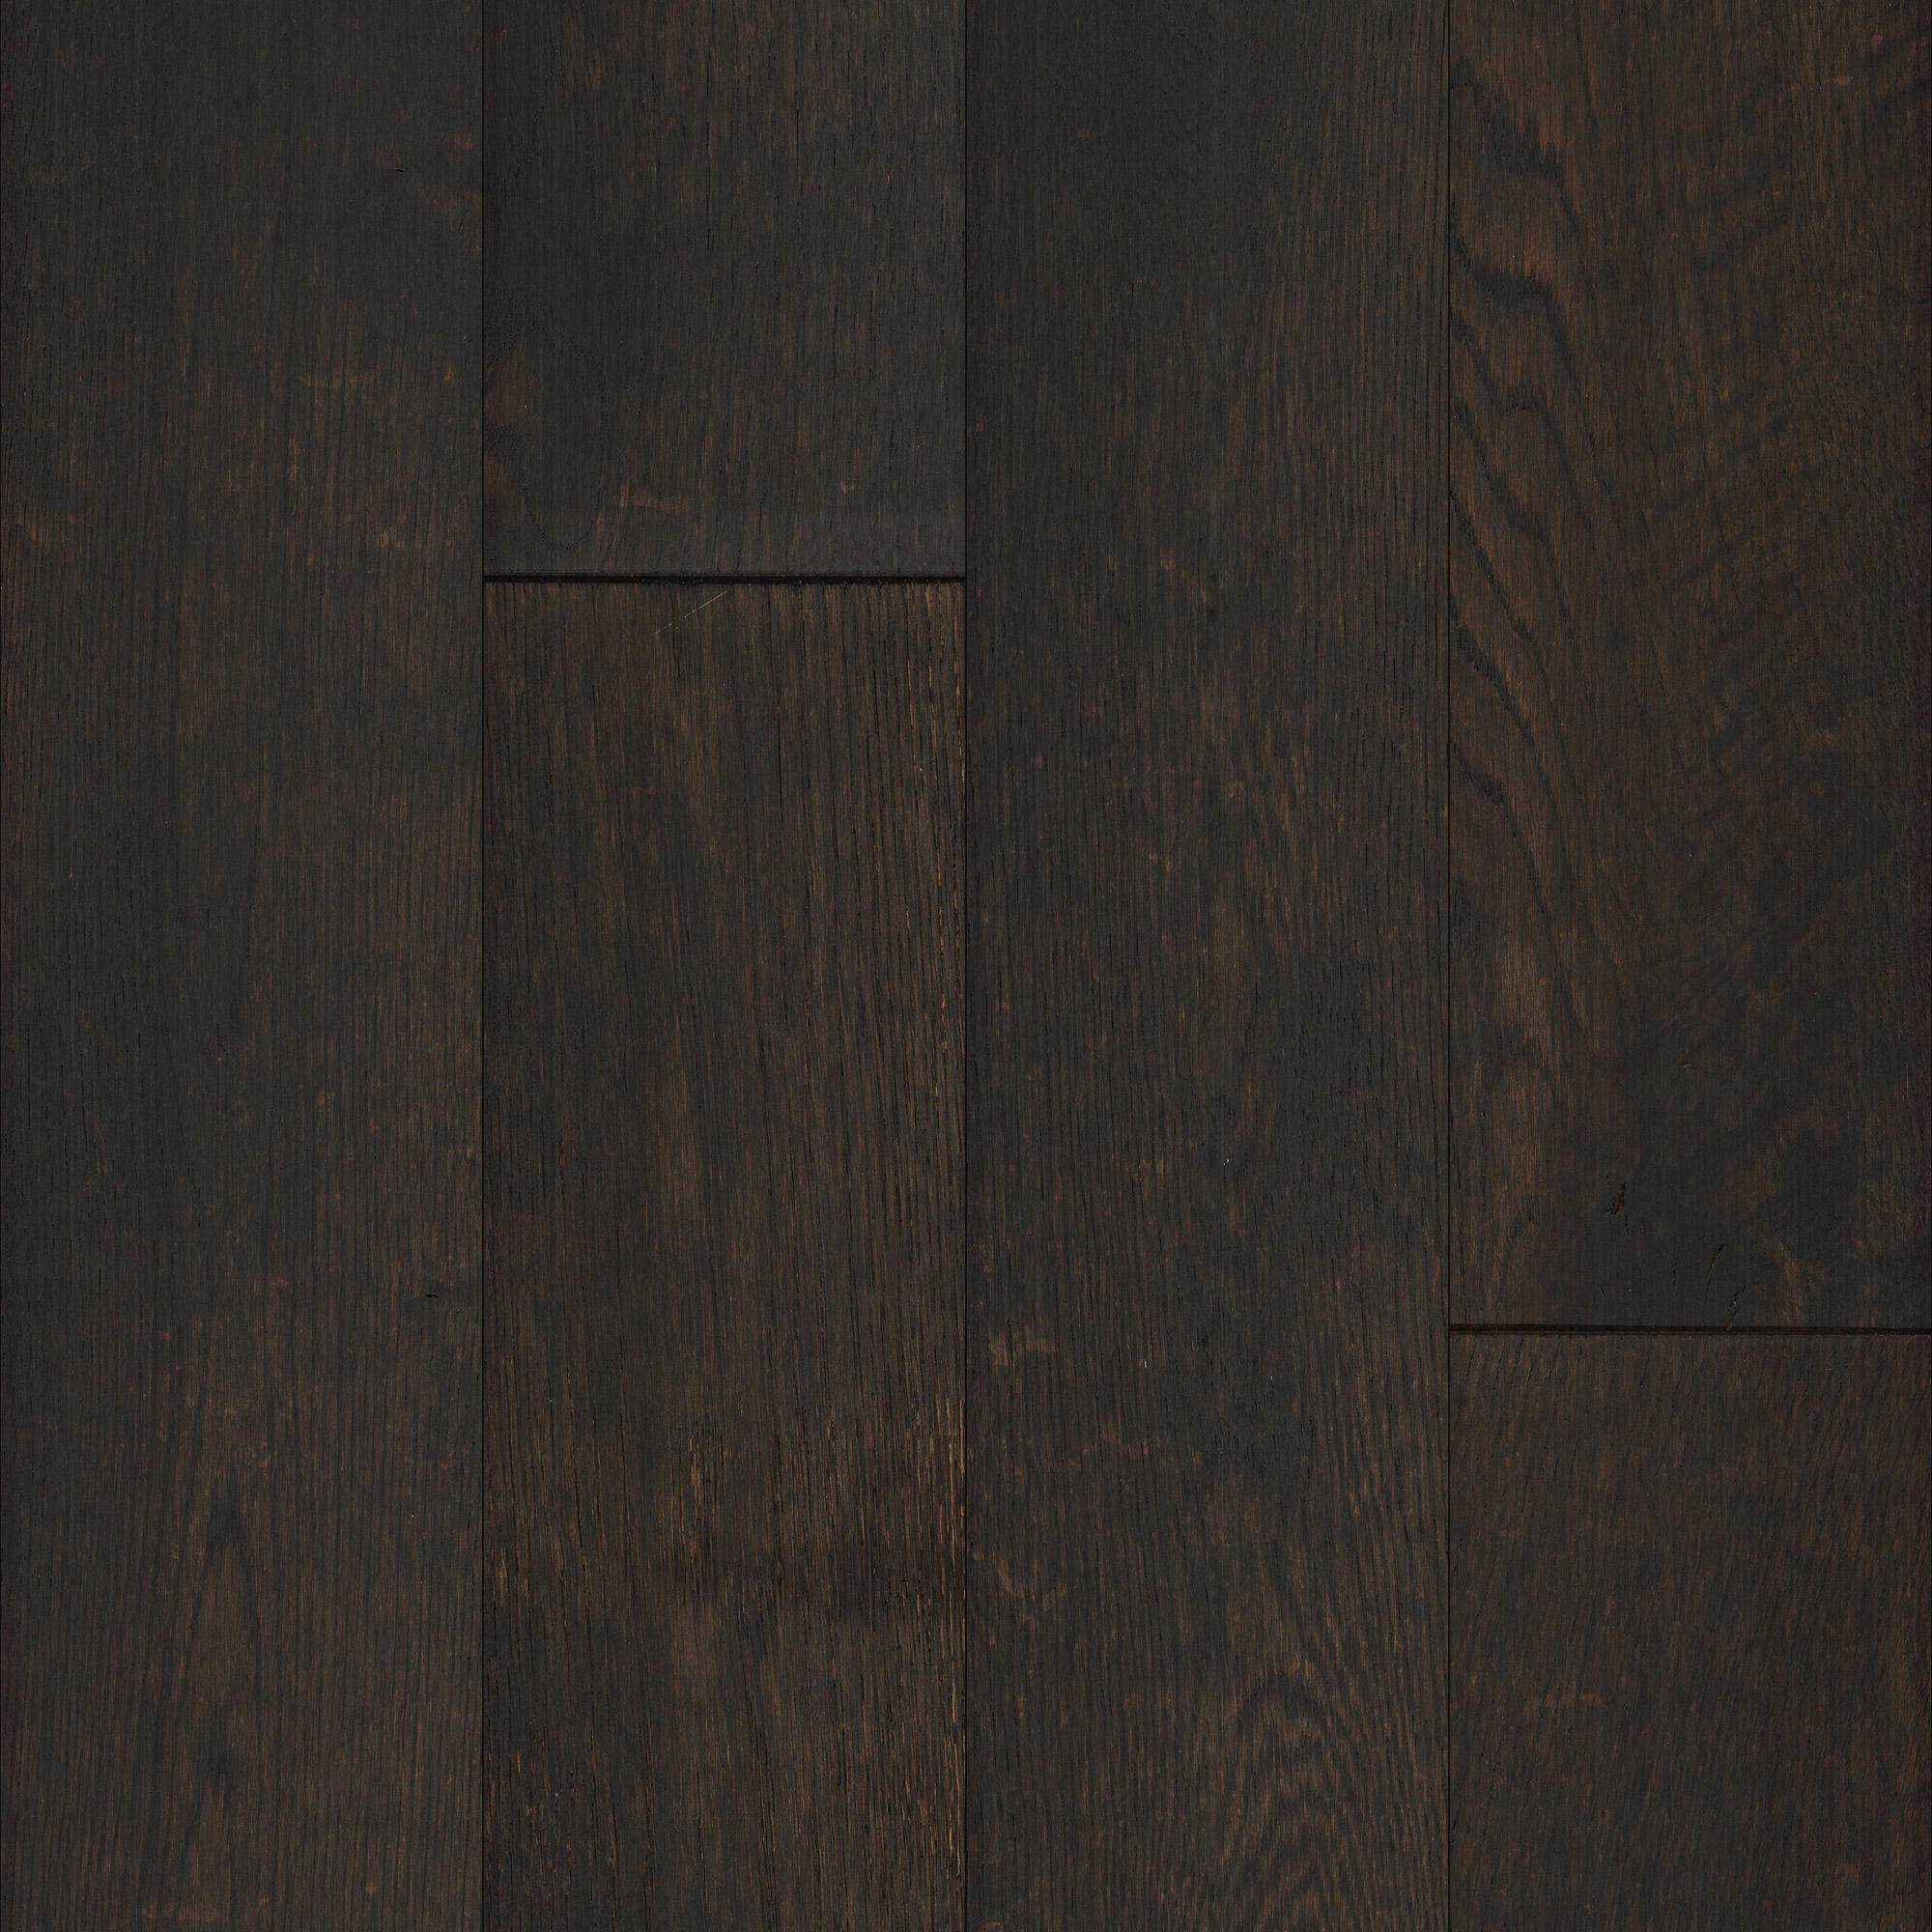 red oak mocha hardwood floors of mullican wexford oak harbor mist 5 wide solid hardwood flooring for file 447 1